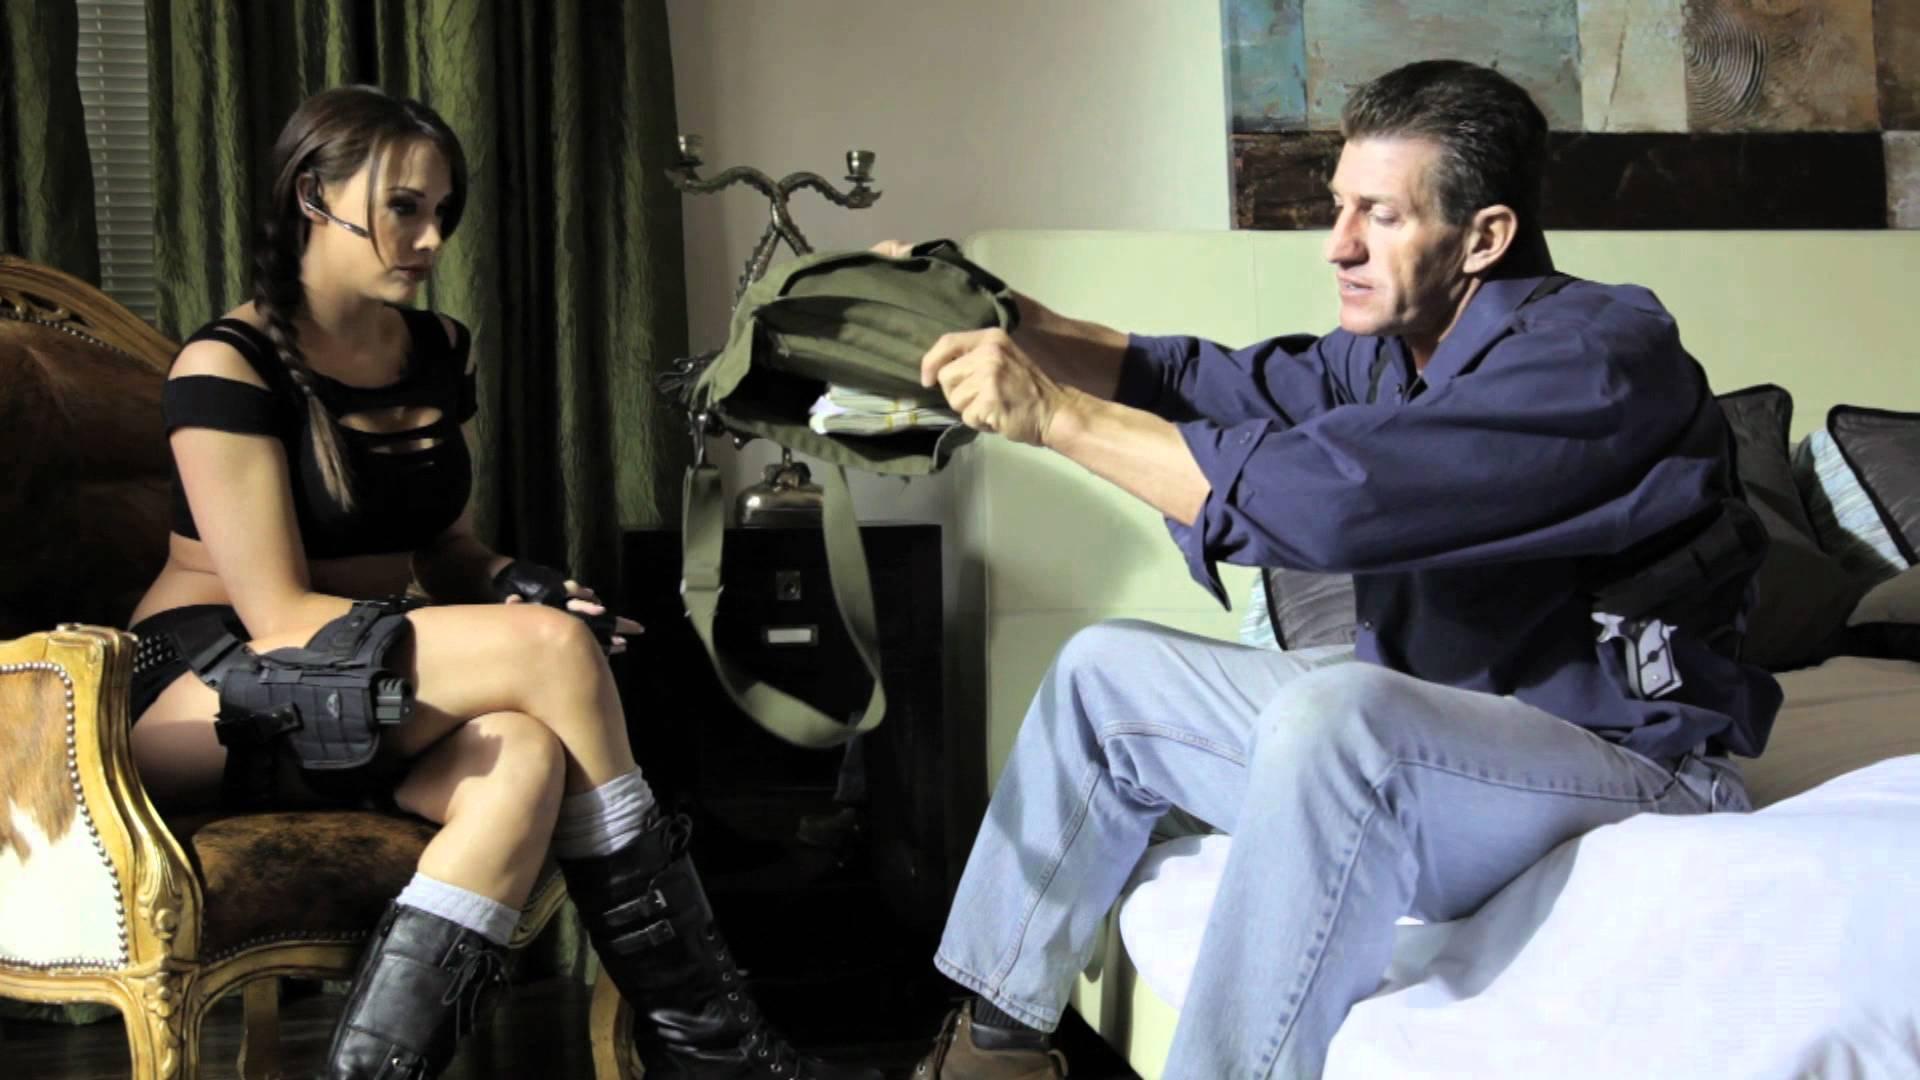 Tomb Raider An Exquisite Films Parody 1